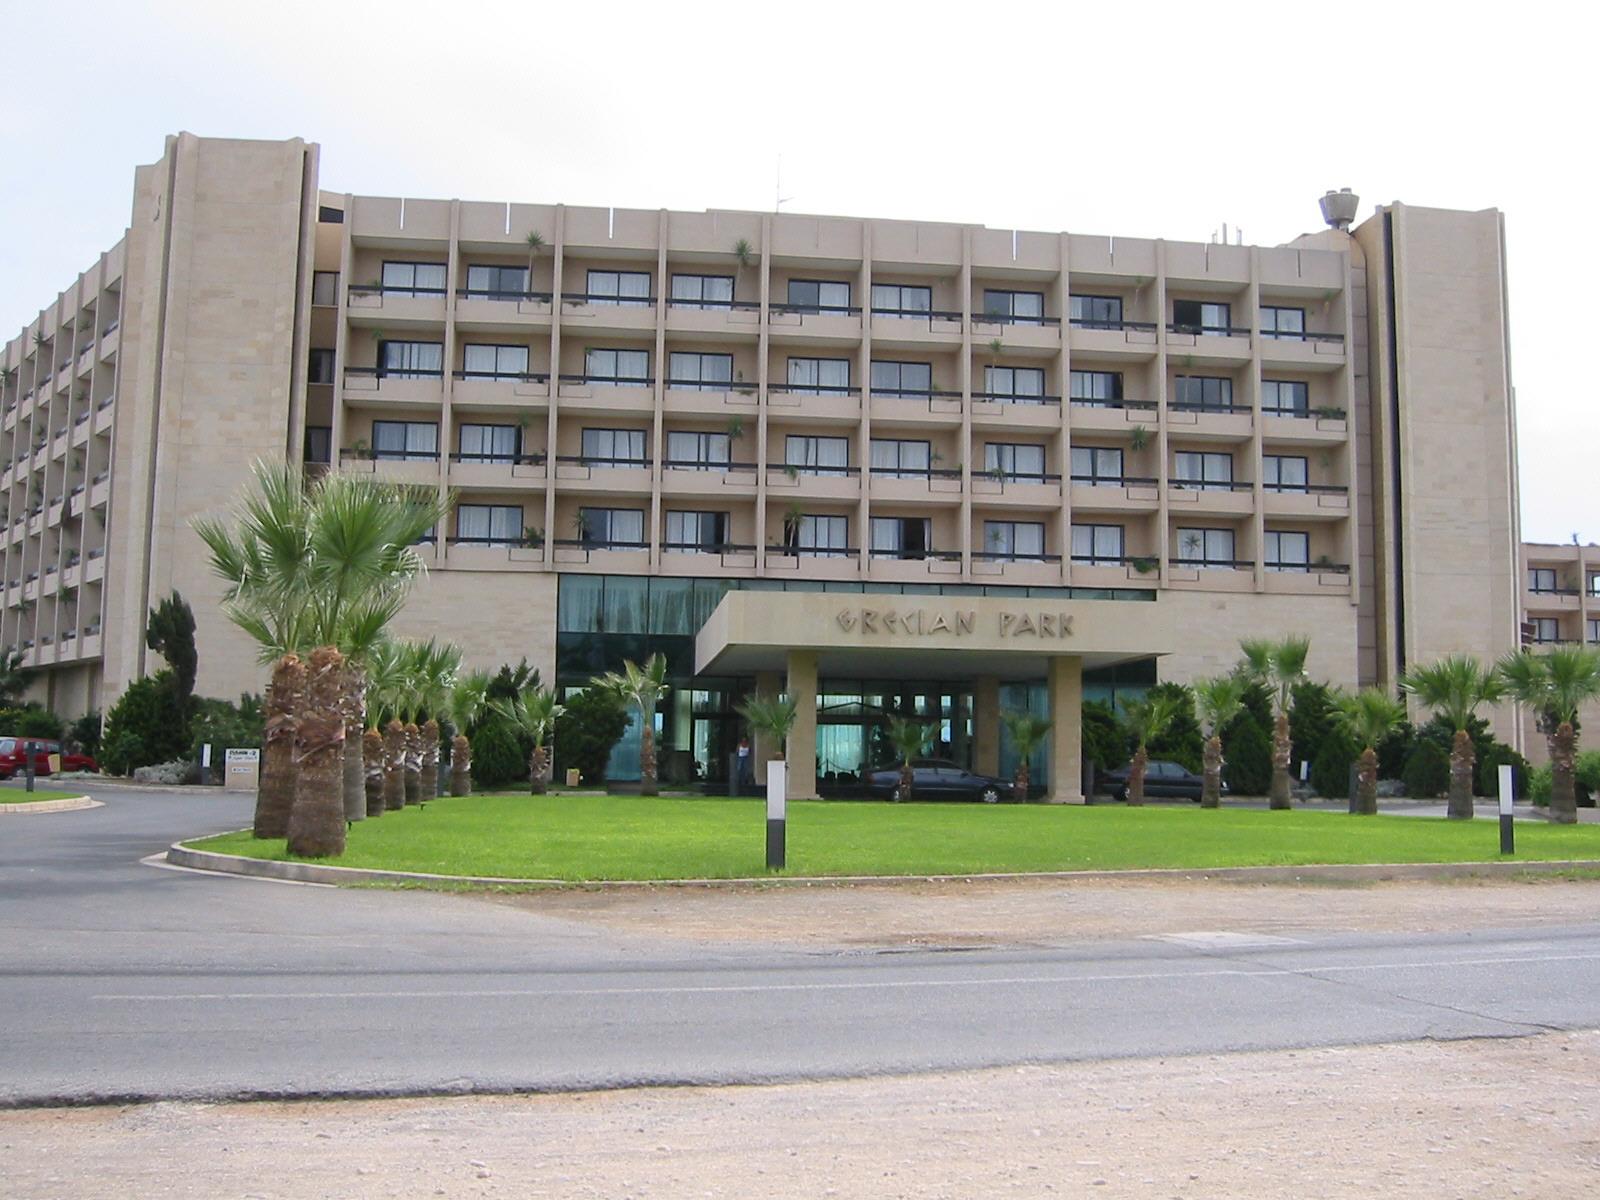 Grecian Park Hotel Zypern